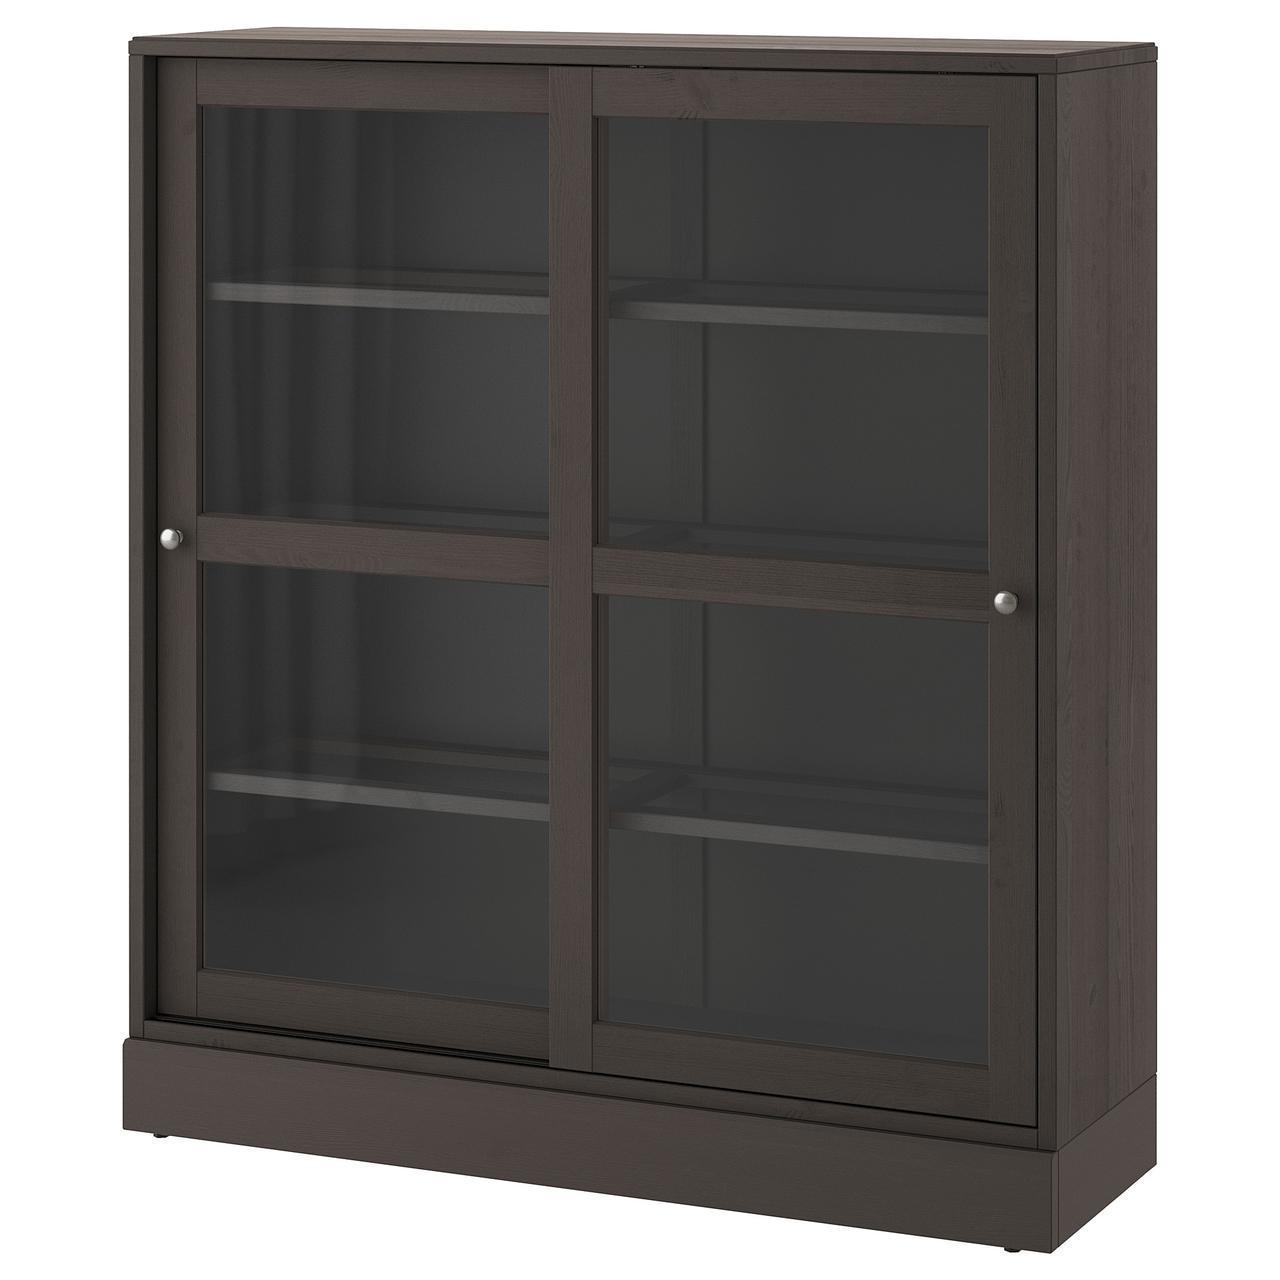 Сервант IKEA HAVSTA 121x134x37 см темно-коричневый 492.768.70